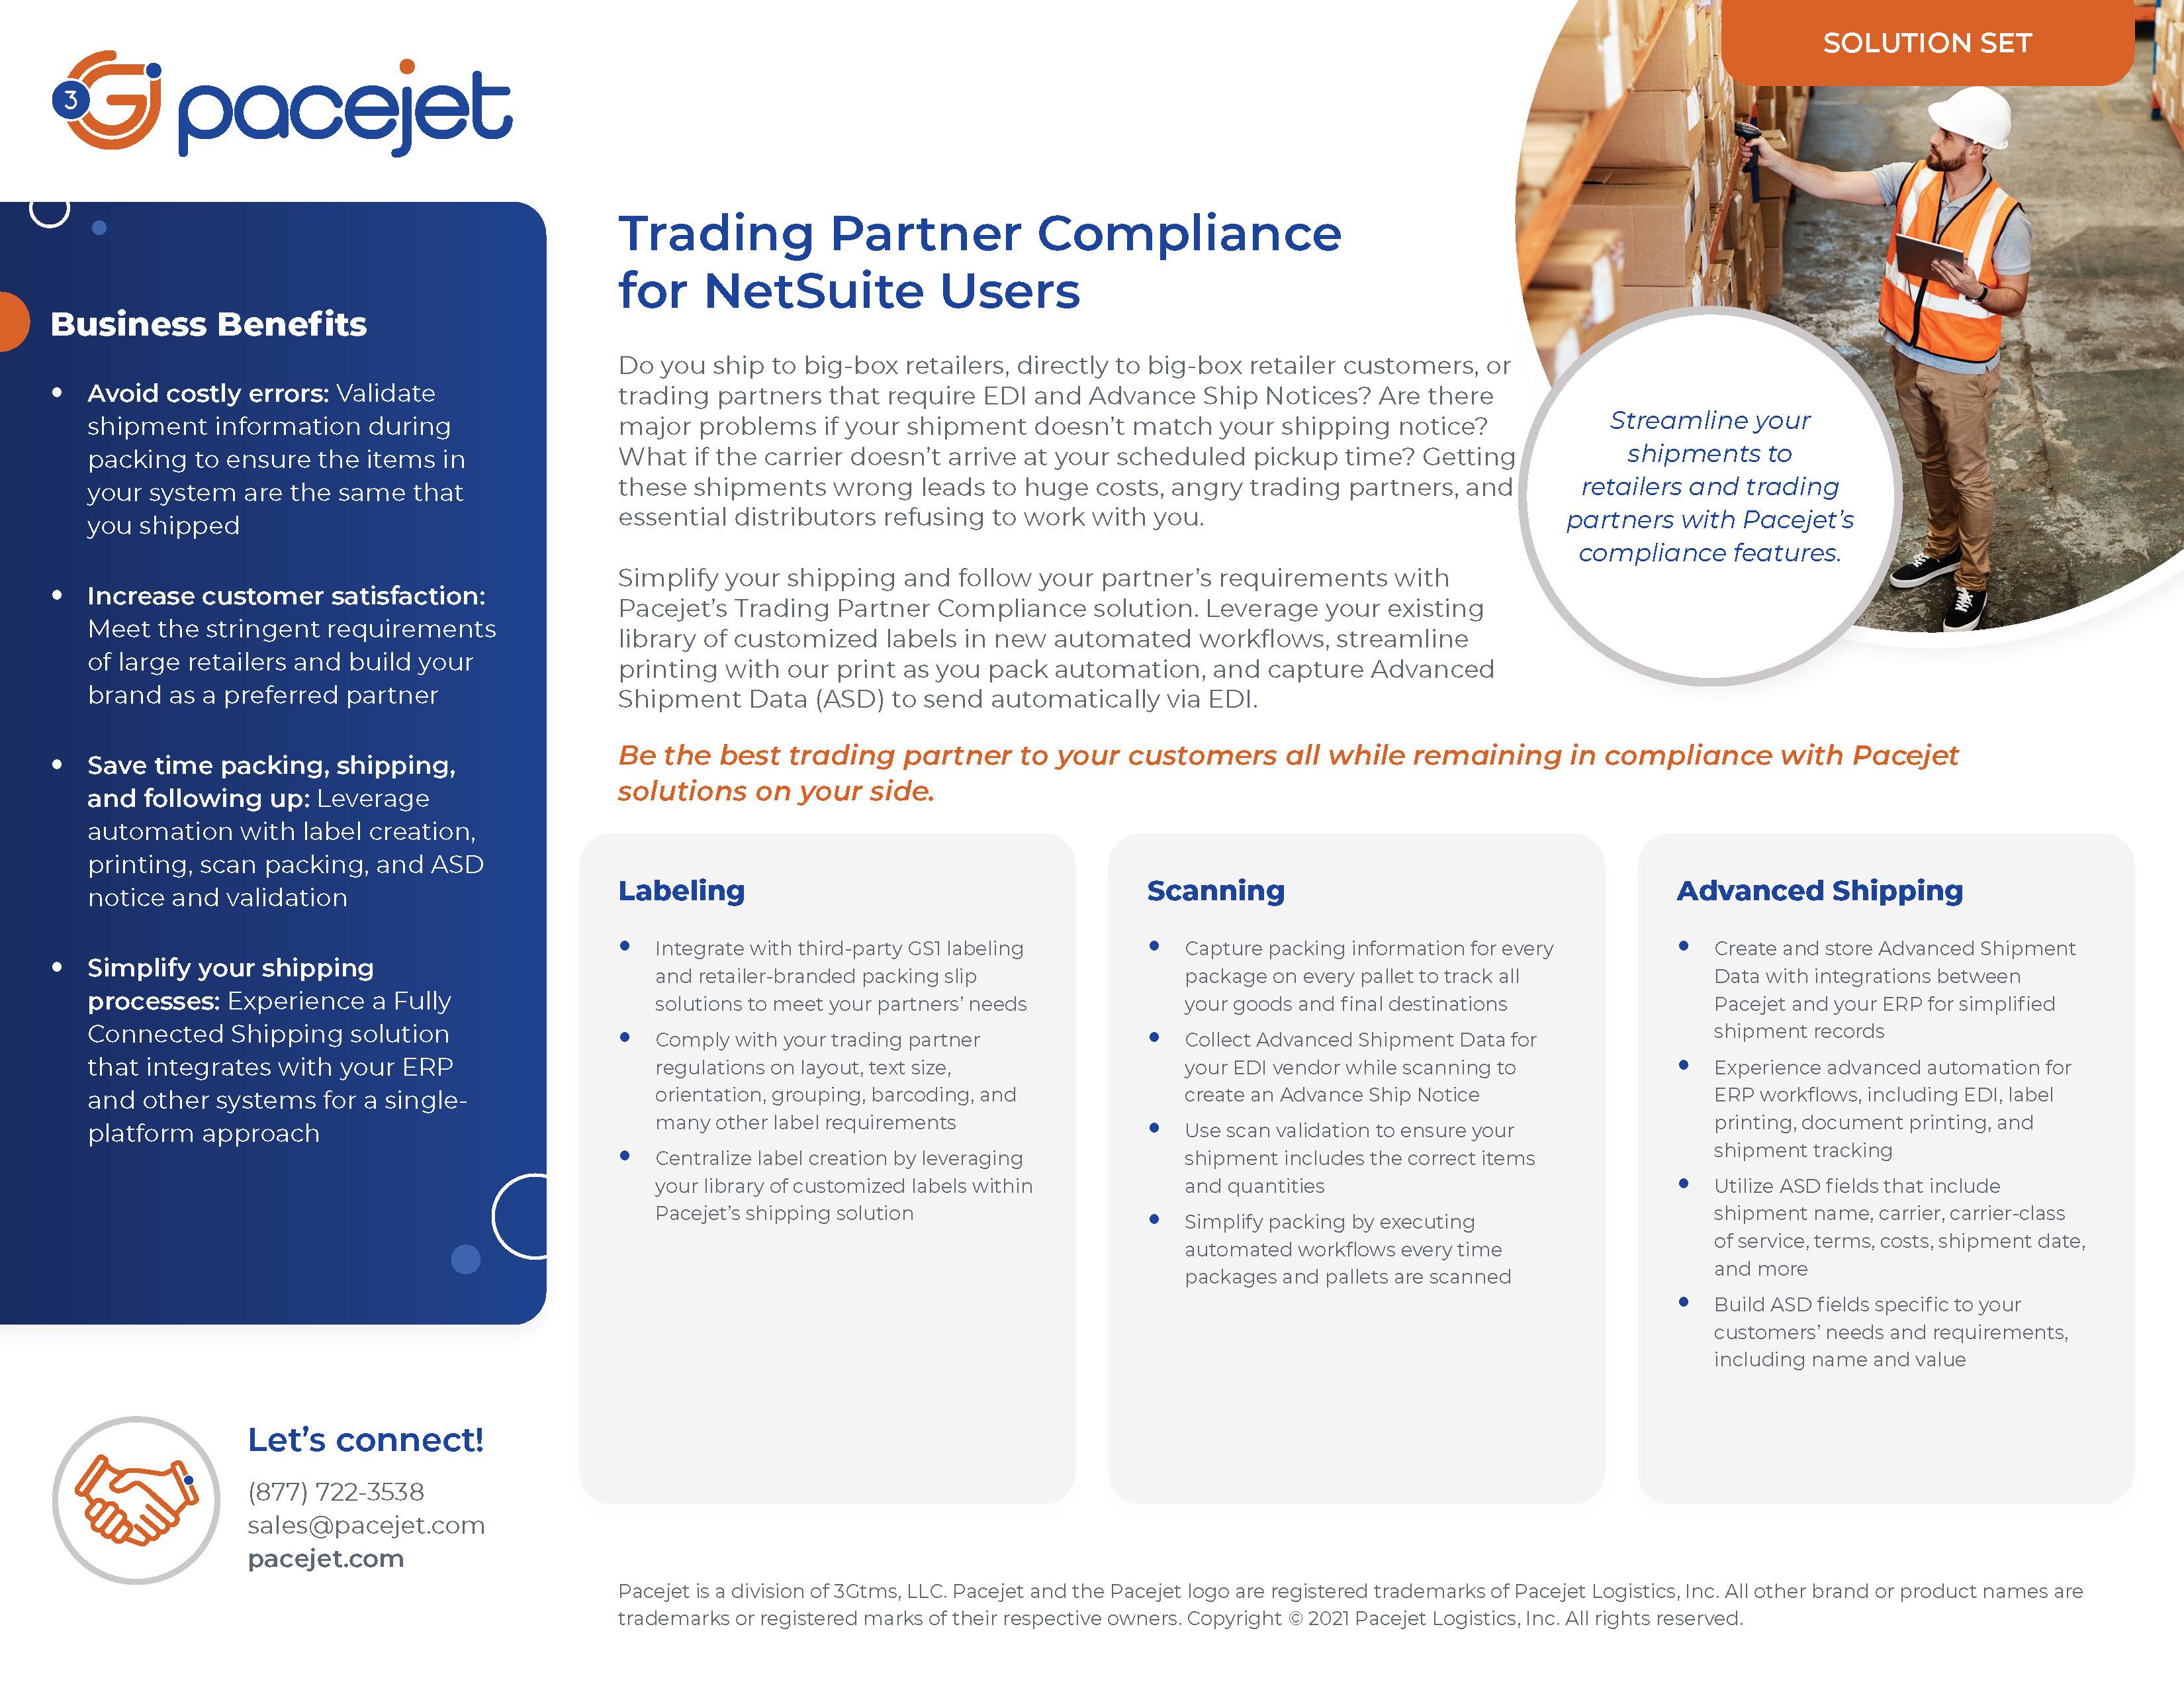 Pacejet-TradingPartnerCompliance-SolutionSet